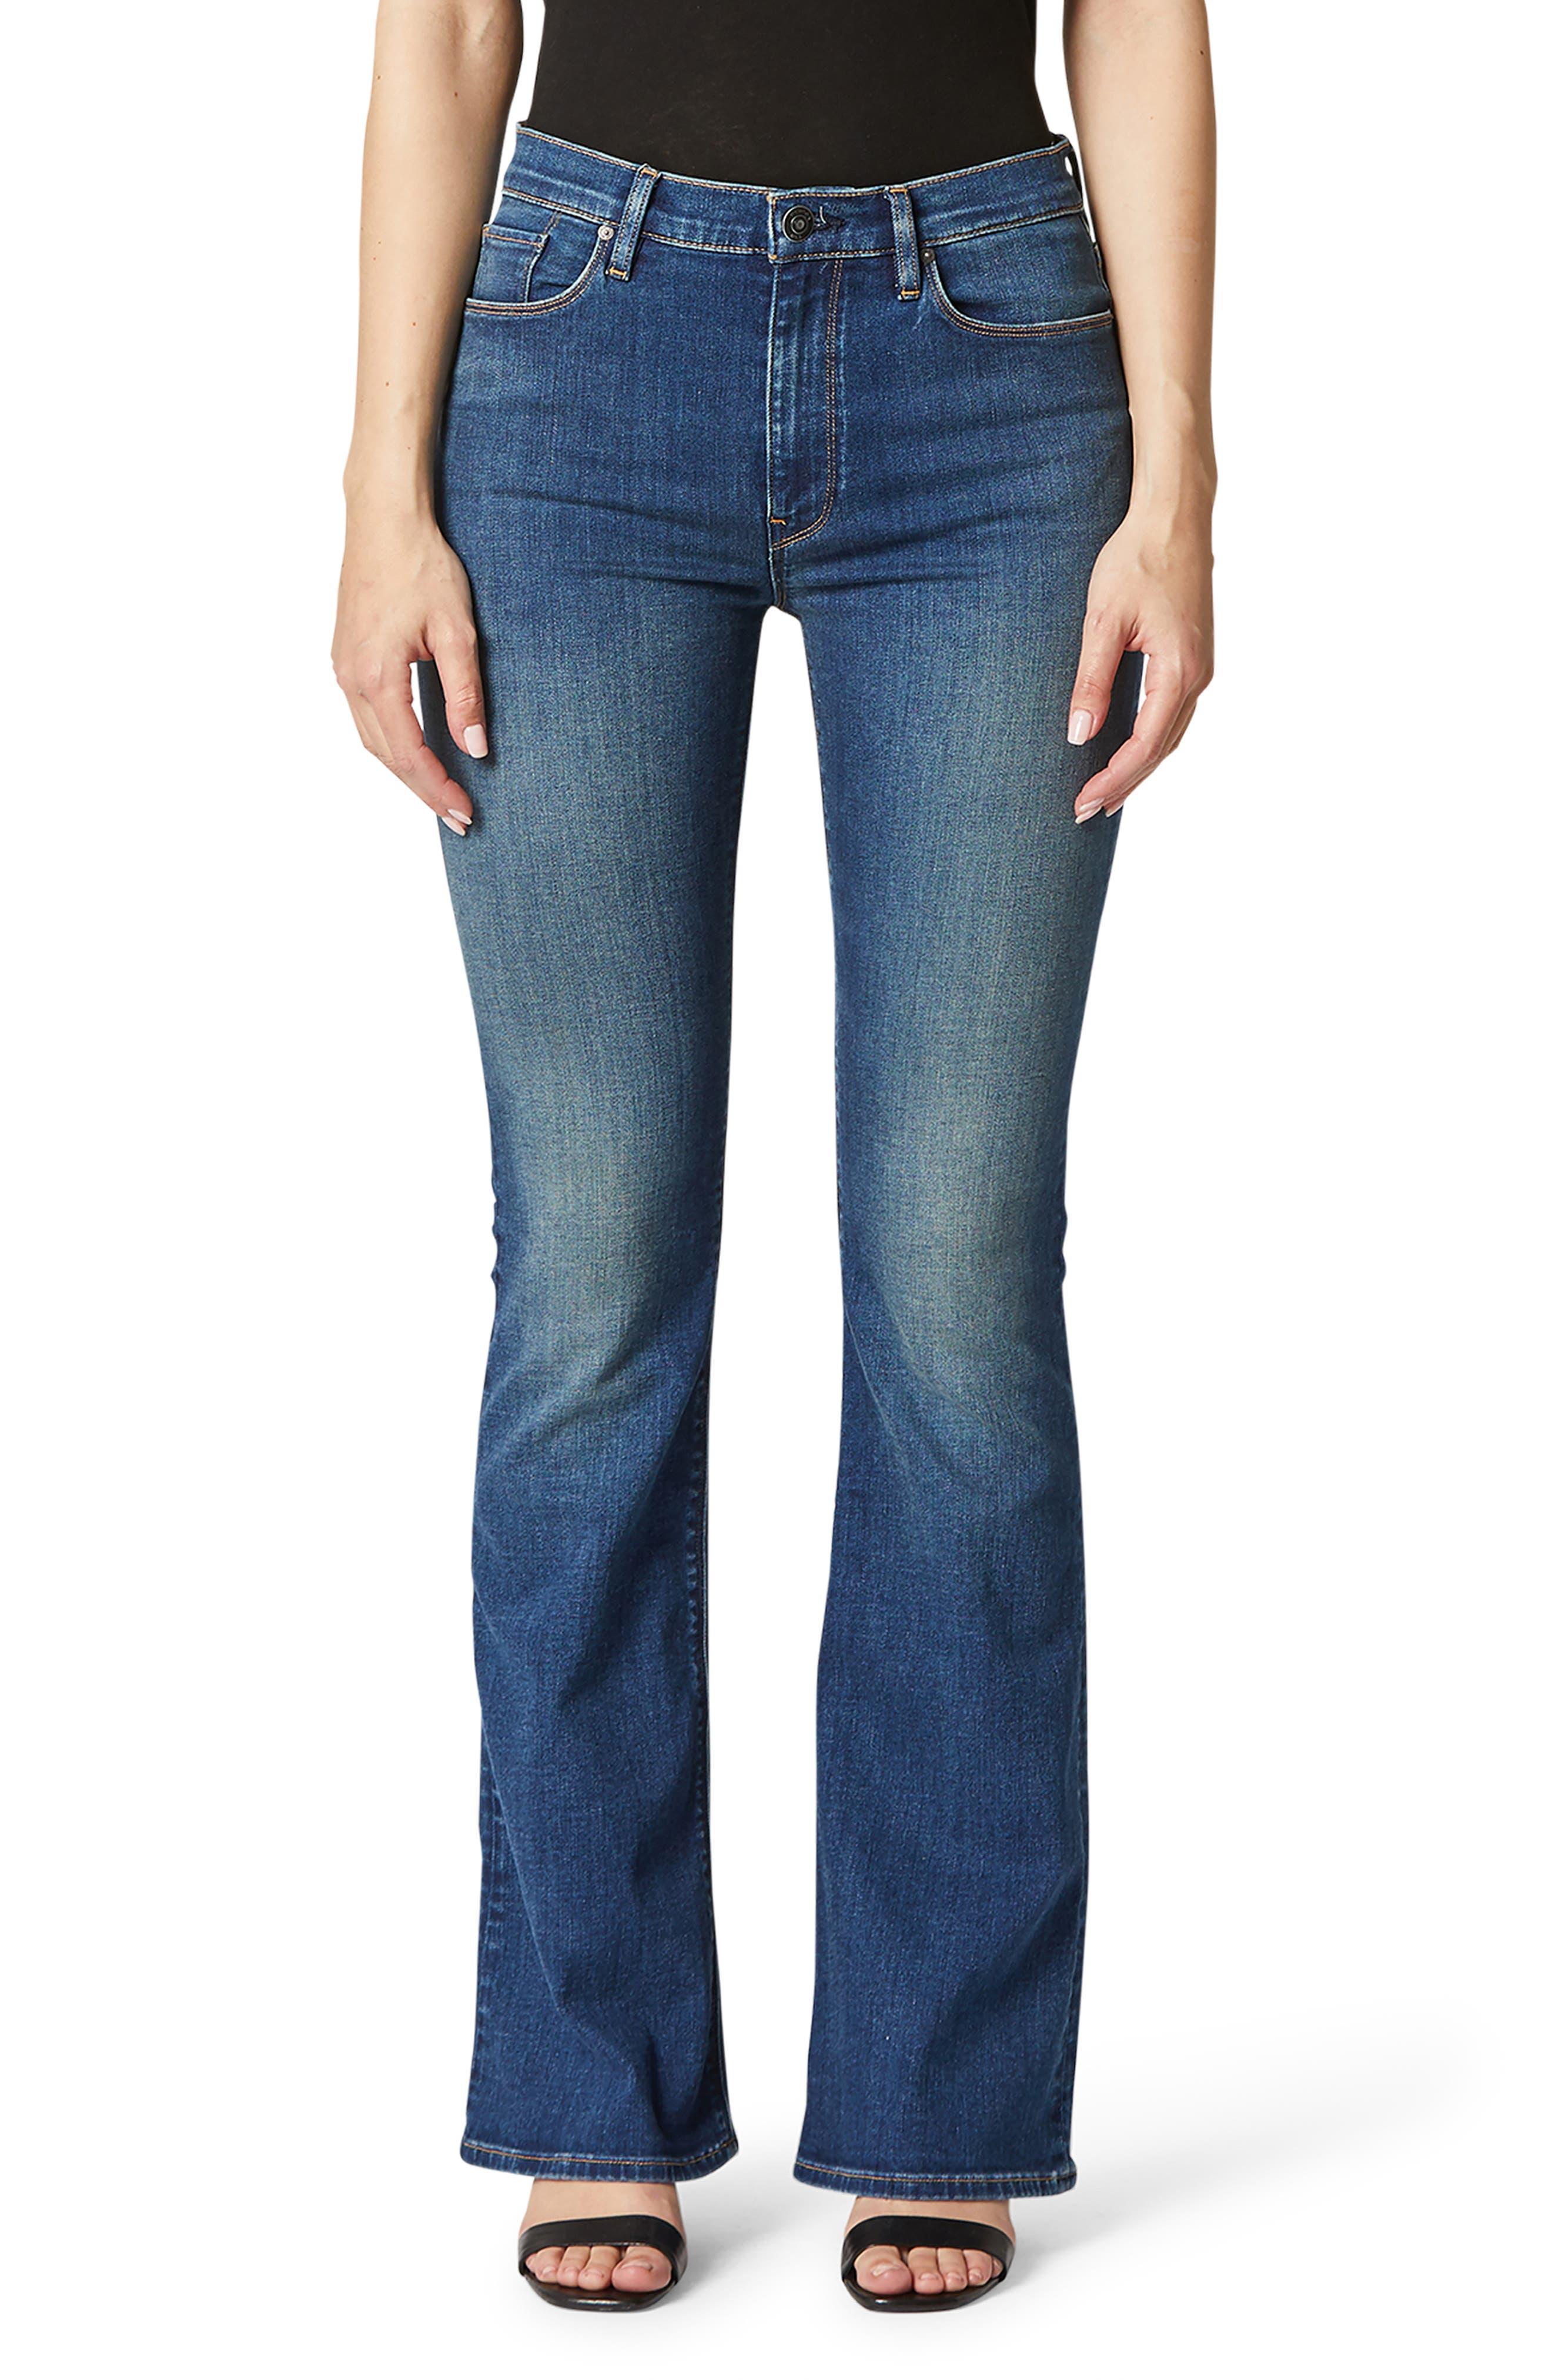 Petite Women's Hudson Jeans Barbara High Waist Bootcut Jeans